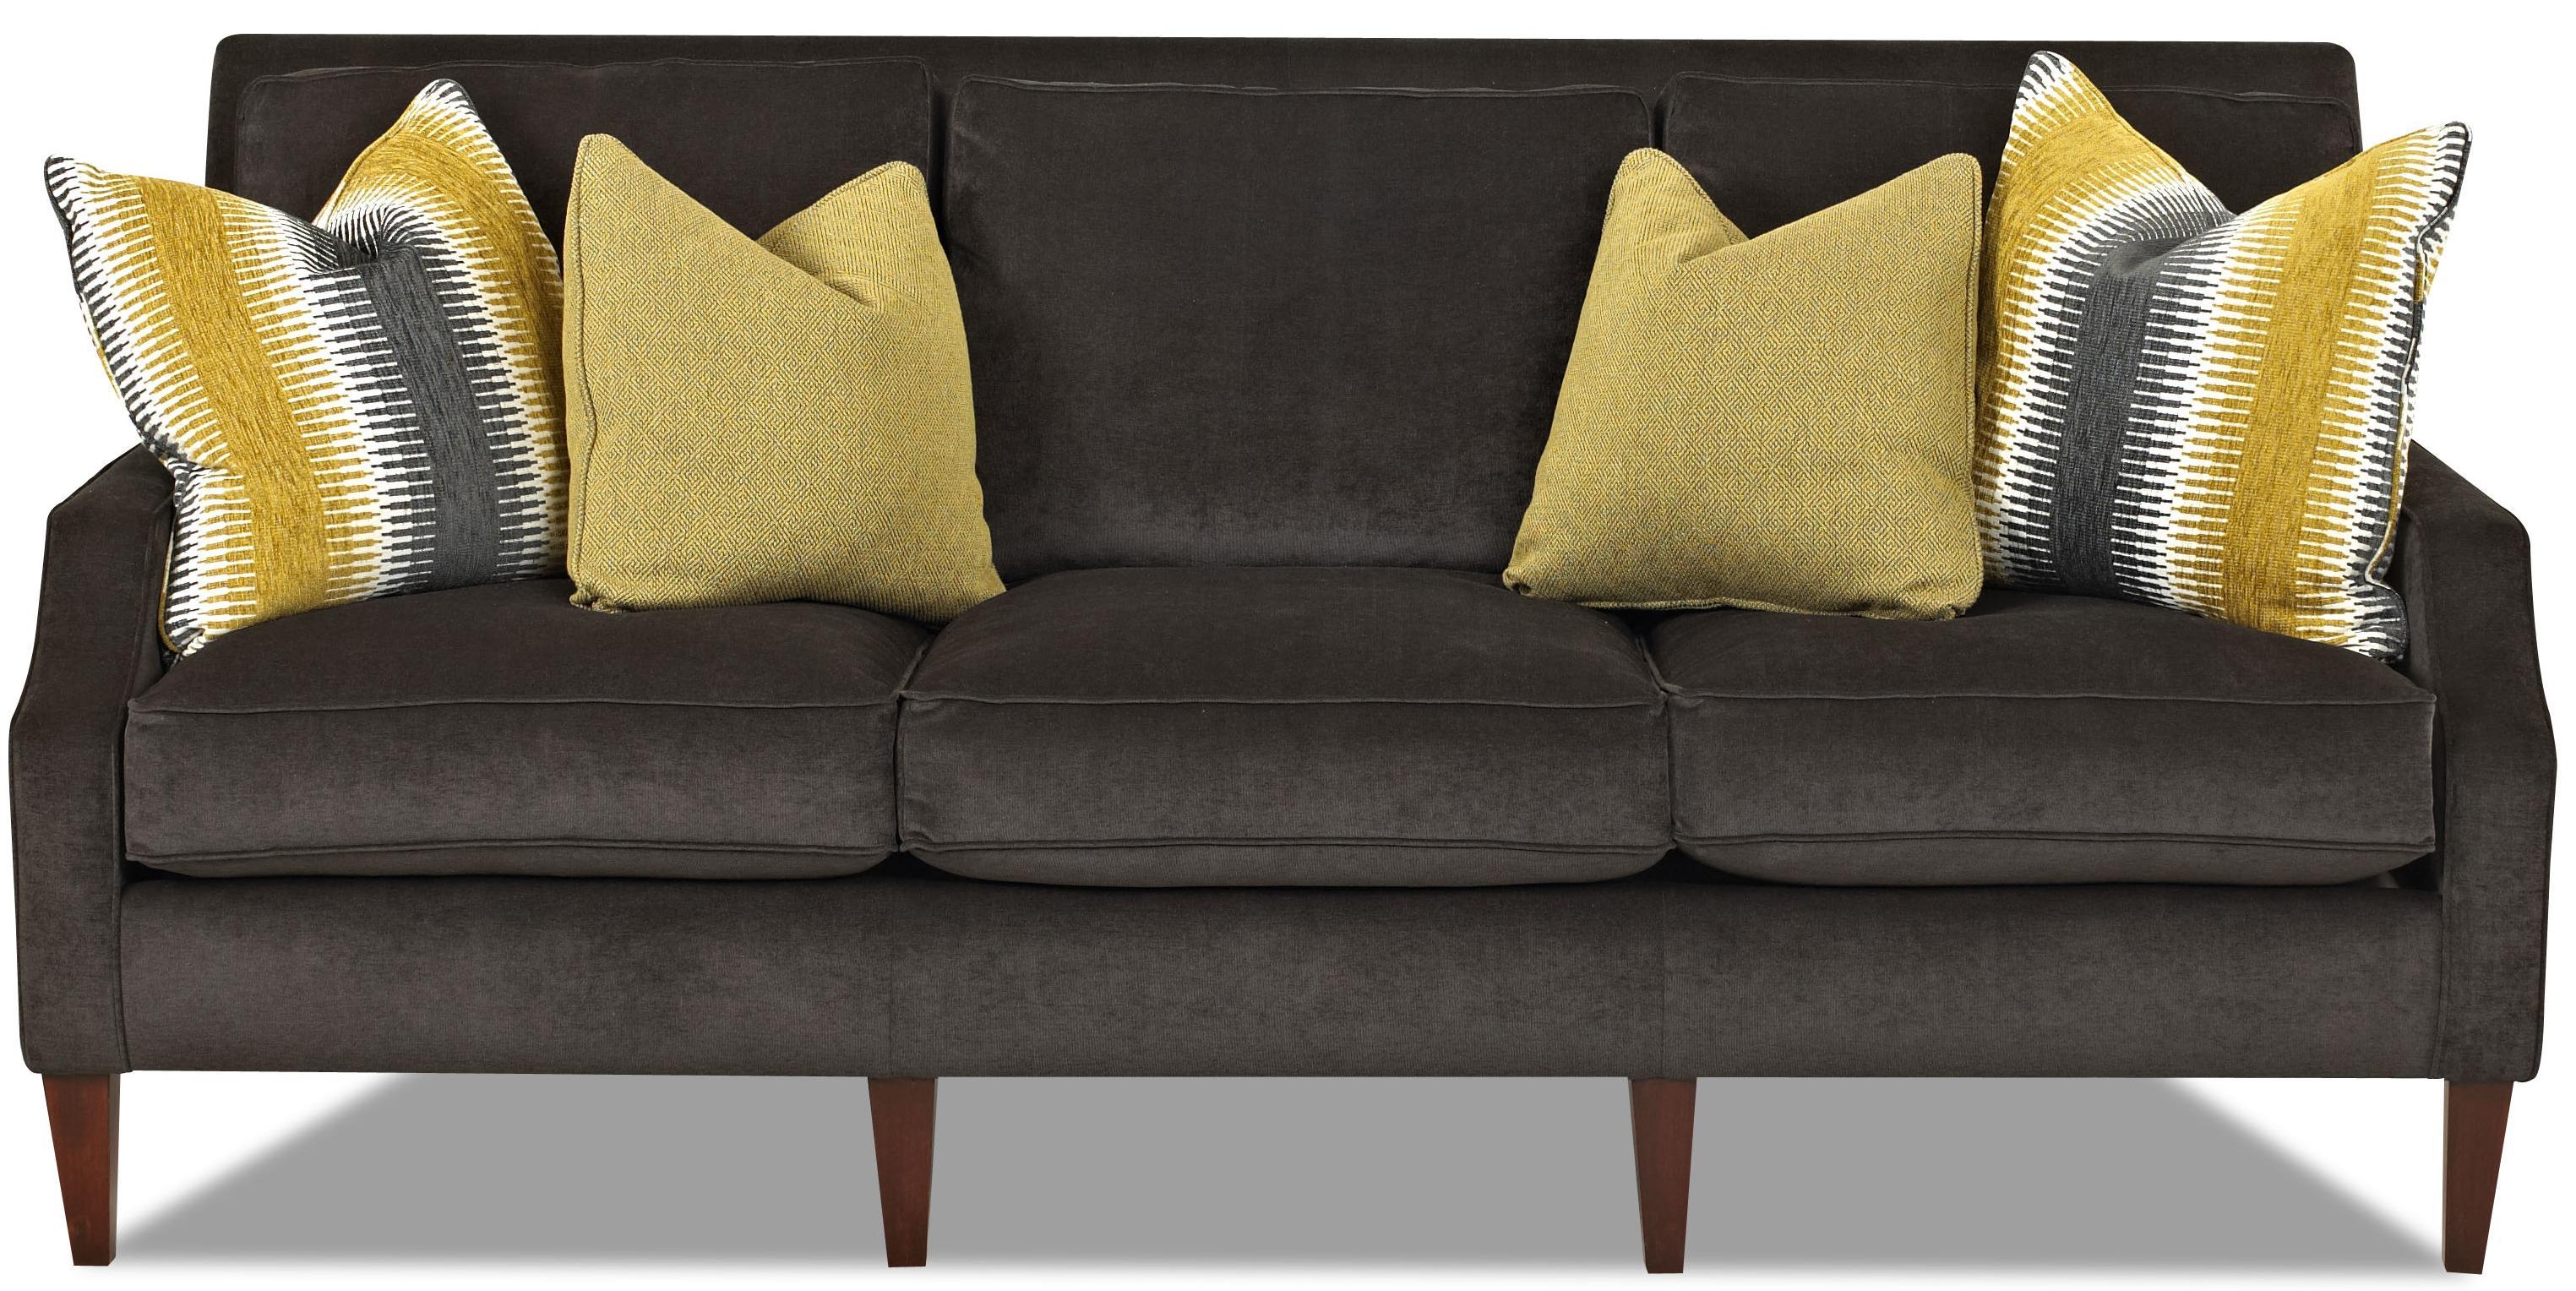 Klaussner Becca Sofa - Item Number: D92400 S